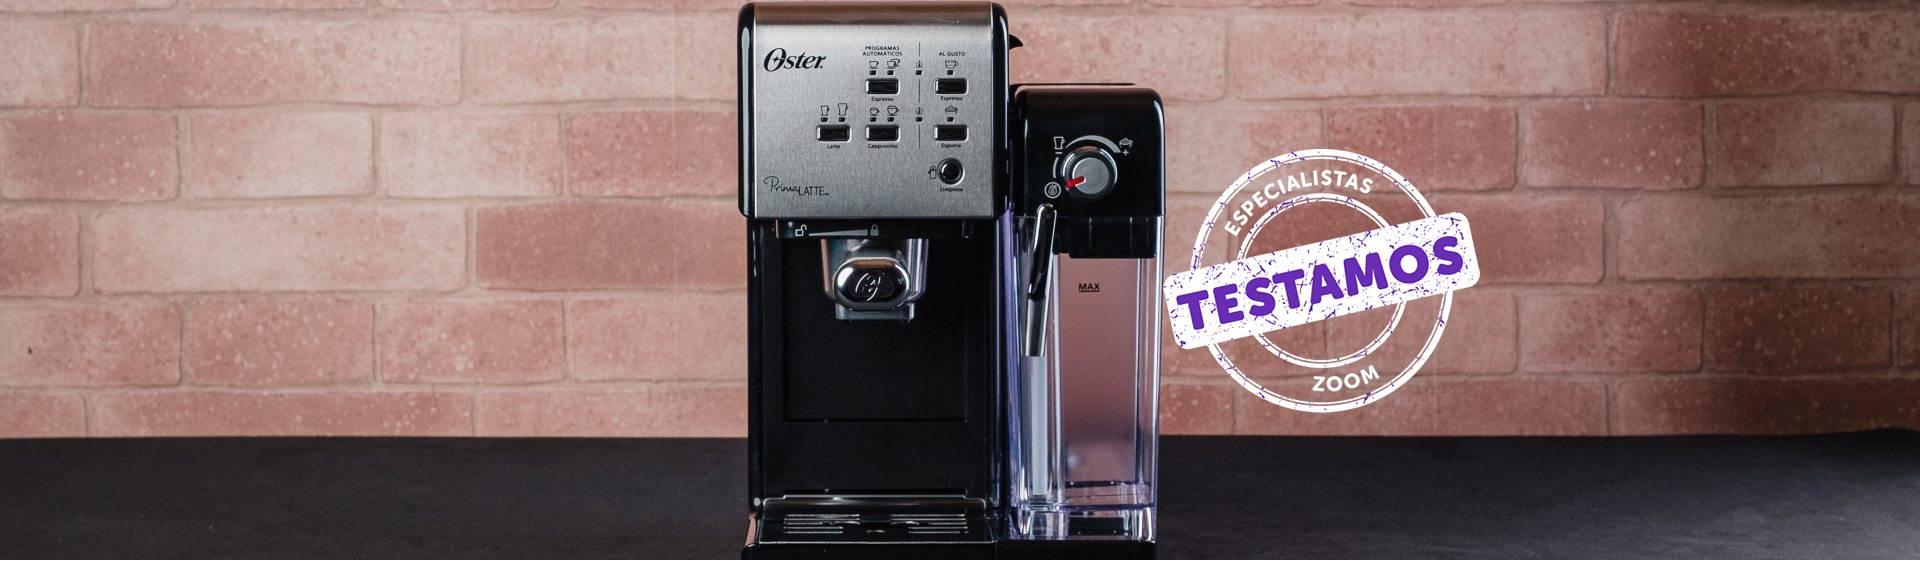 Cafeteira Oster Prima Latte II: multifuncional, mas muito barulhenta